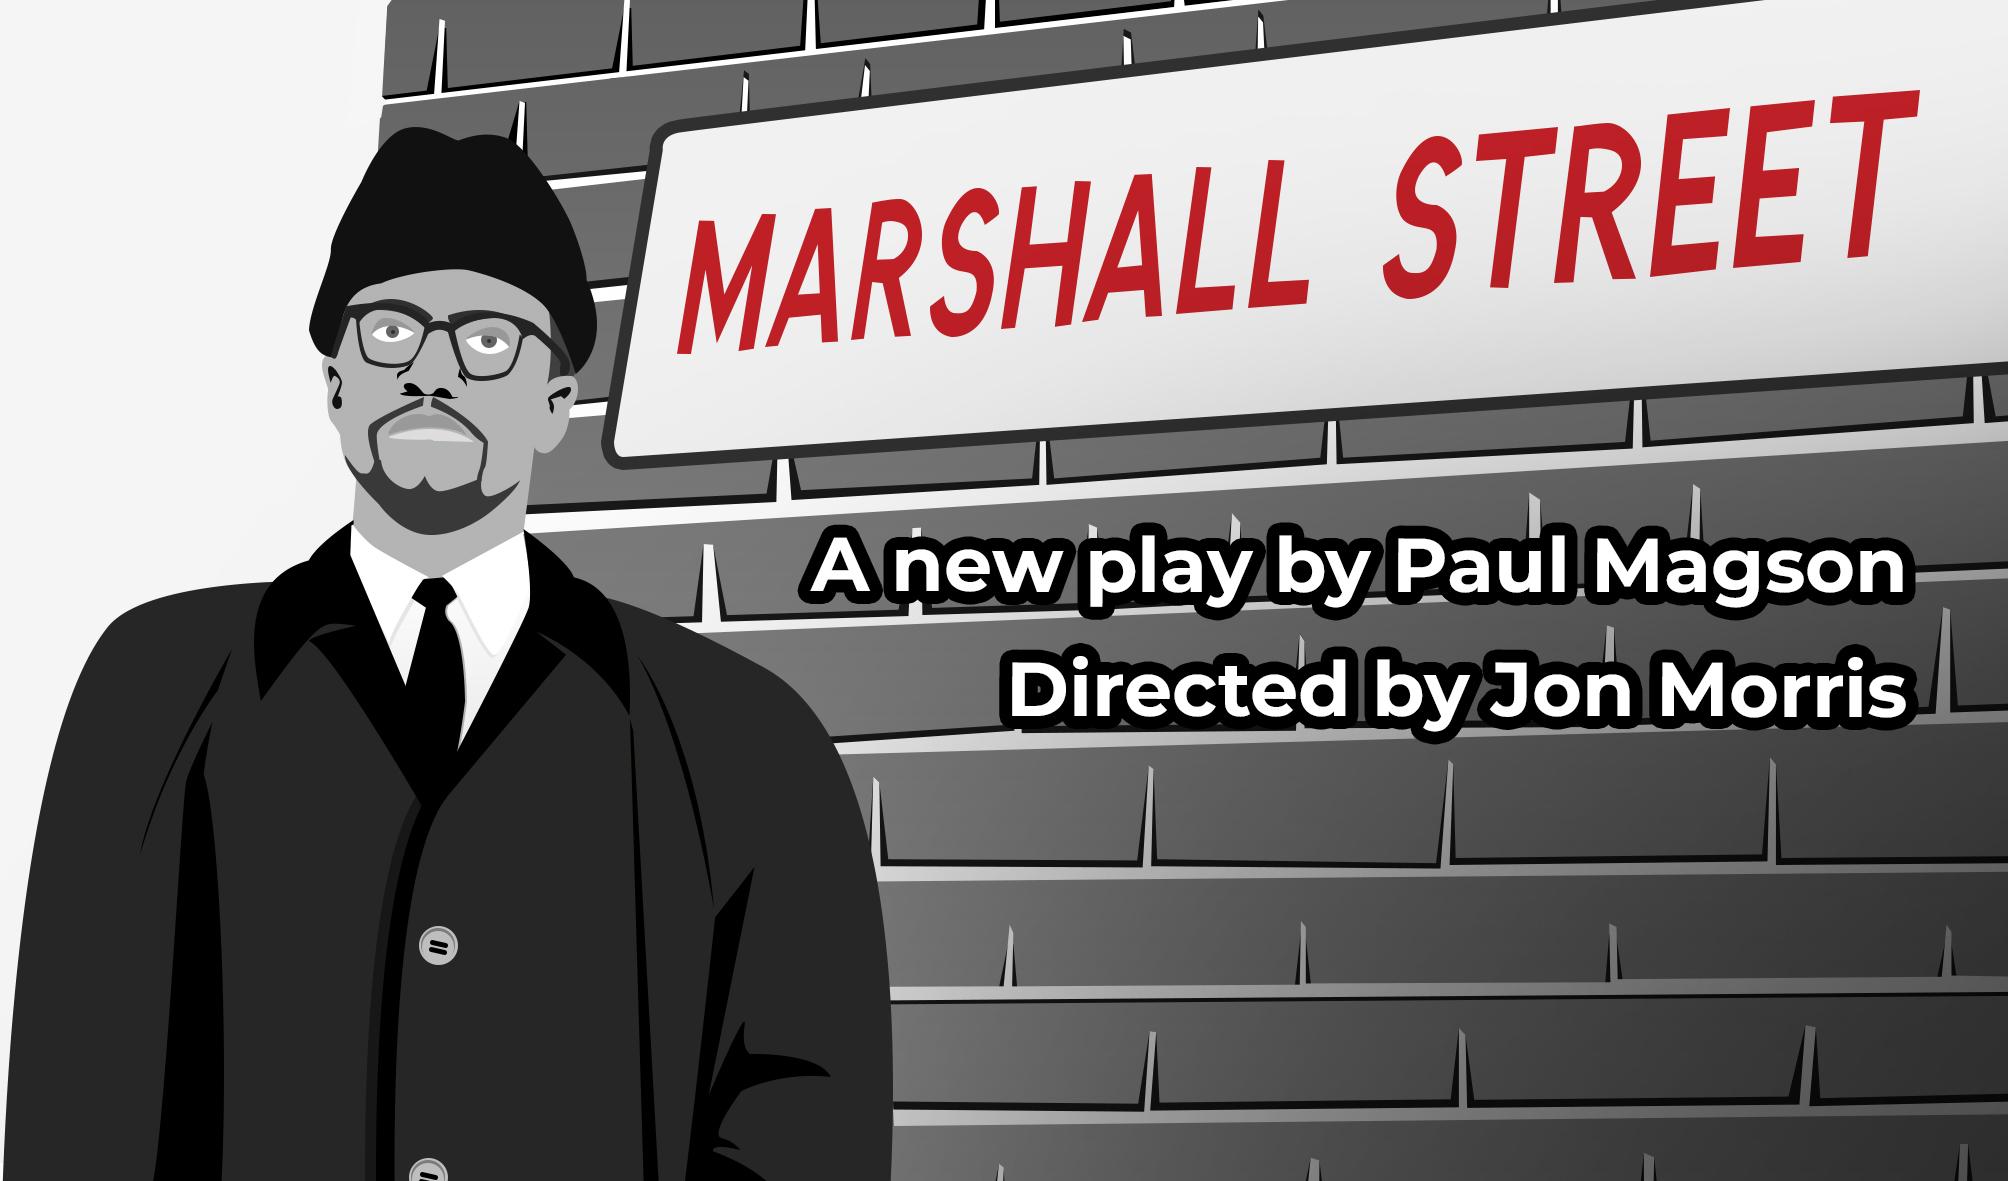 Marshall Street Image with text.jpg